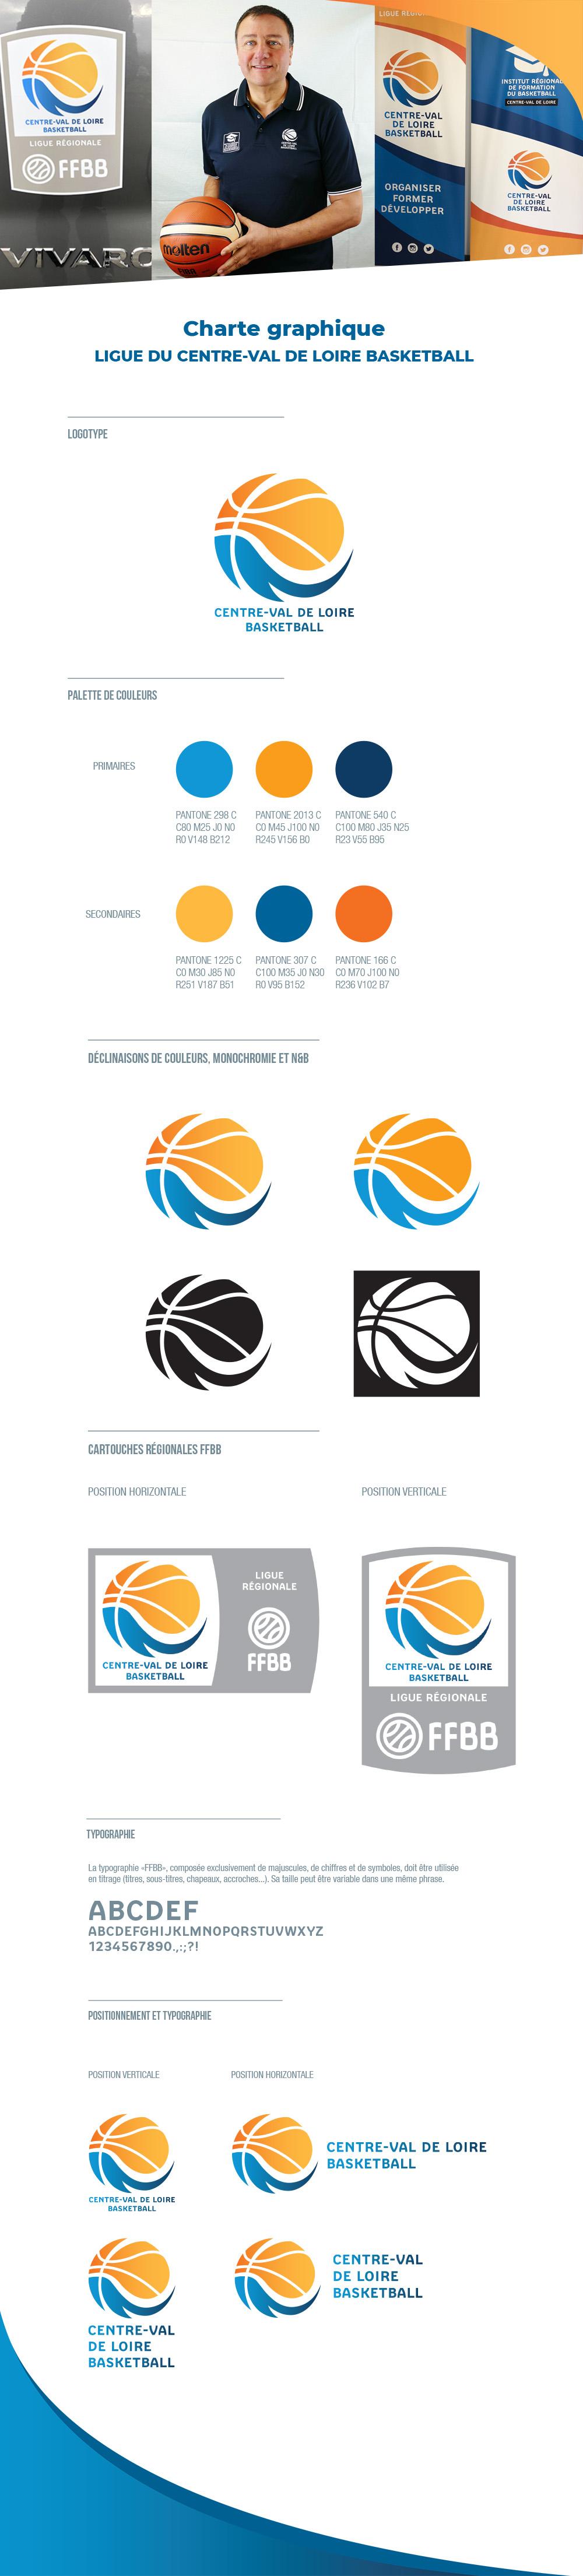 visuel Ligue Centre-Val de Loire de Basketball